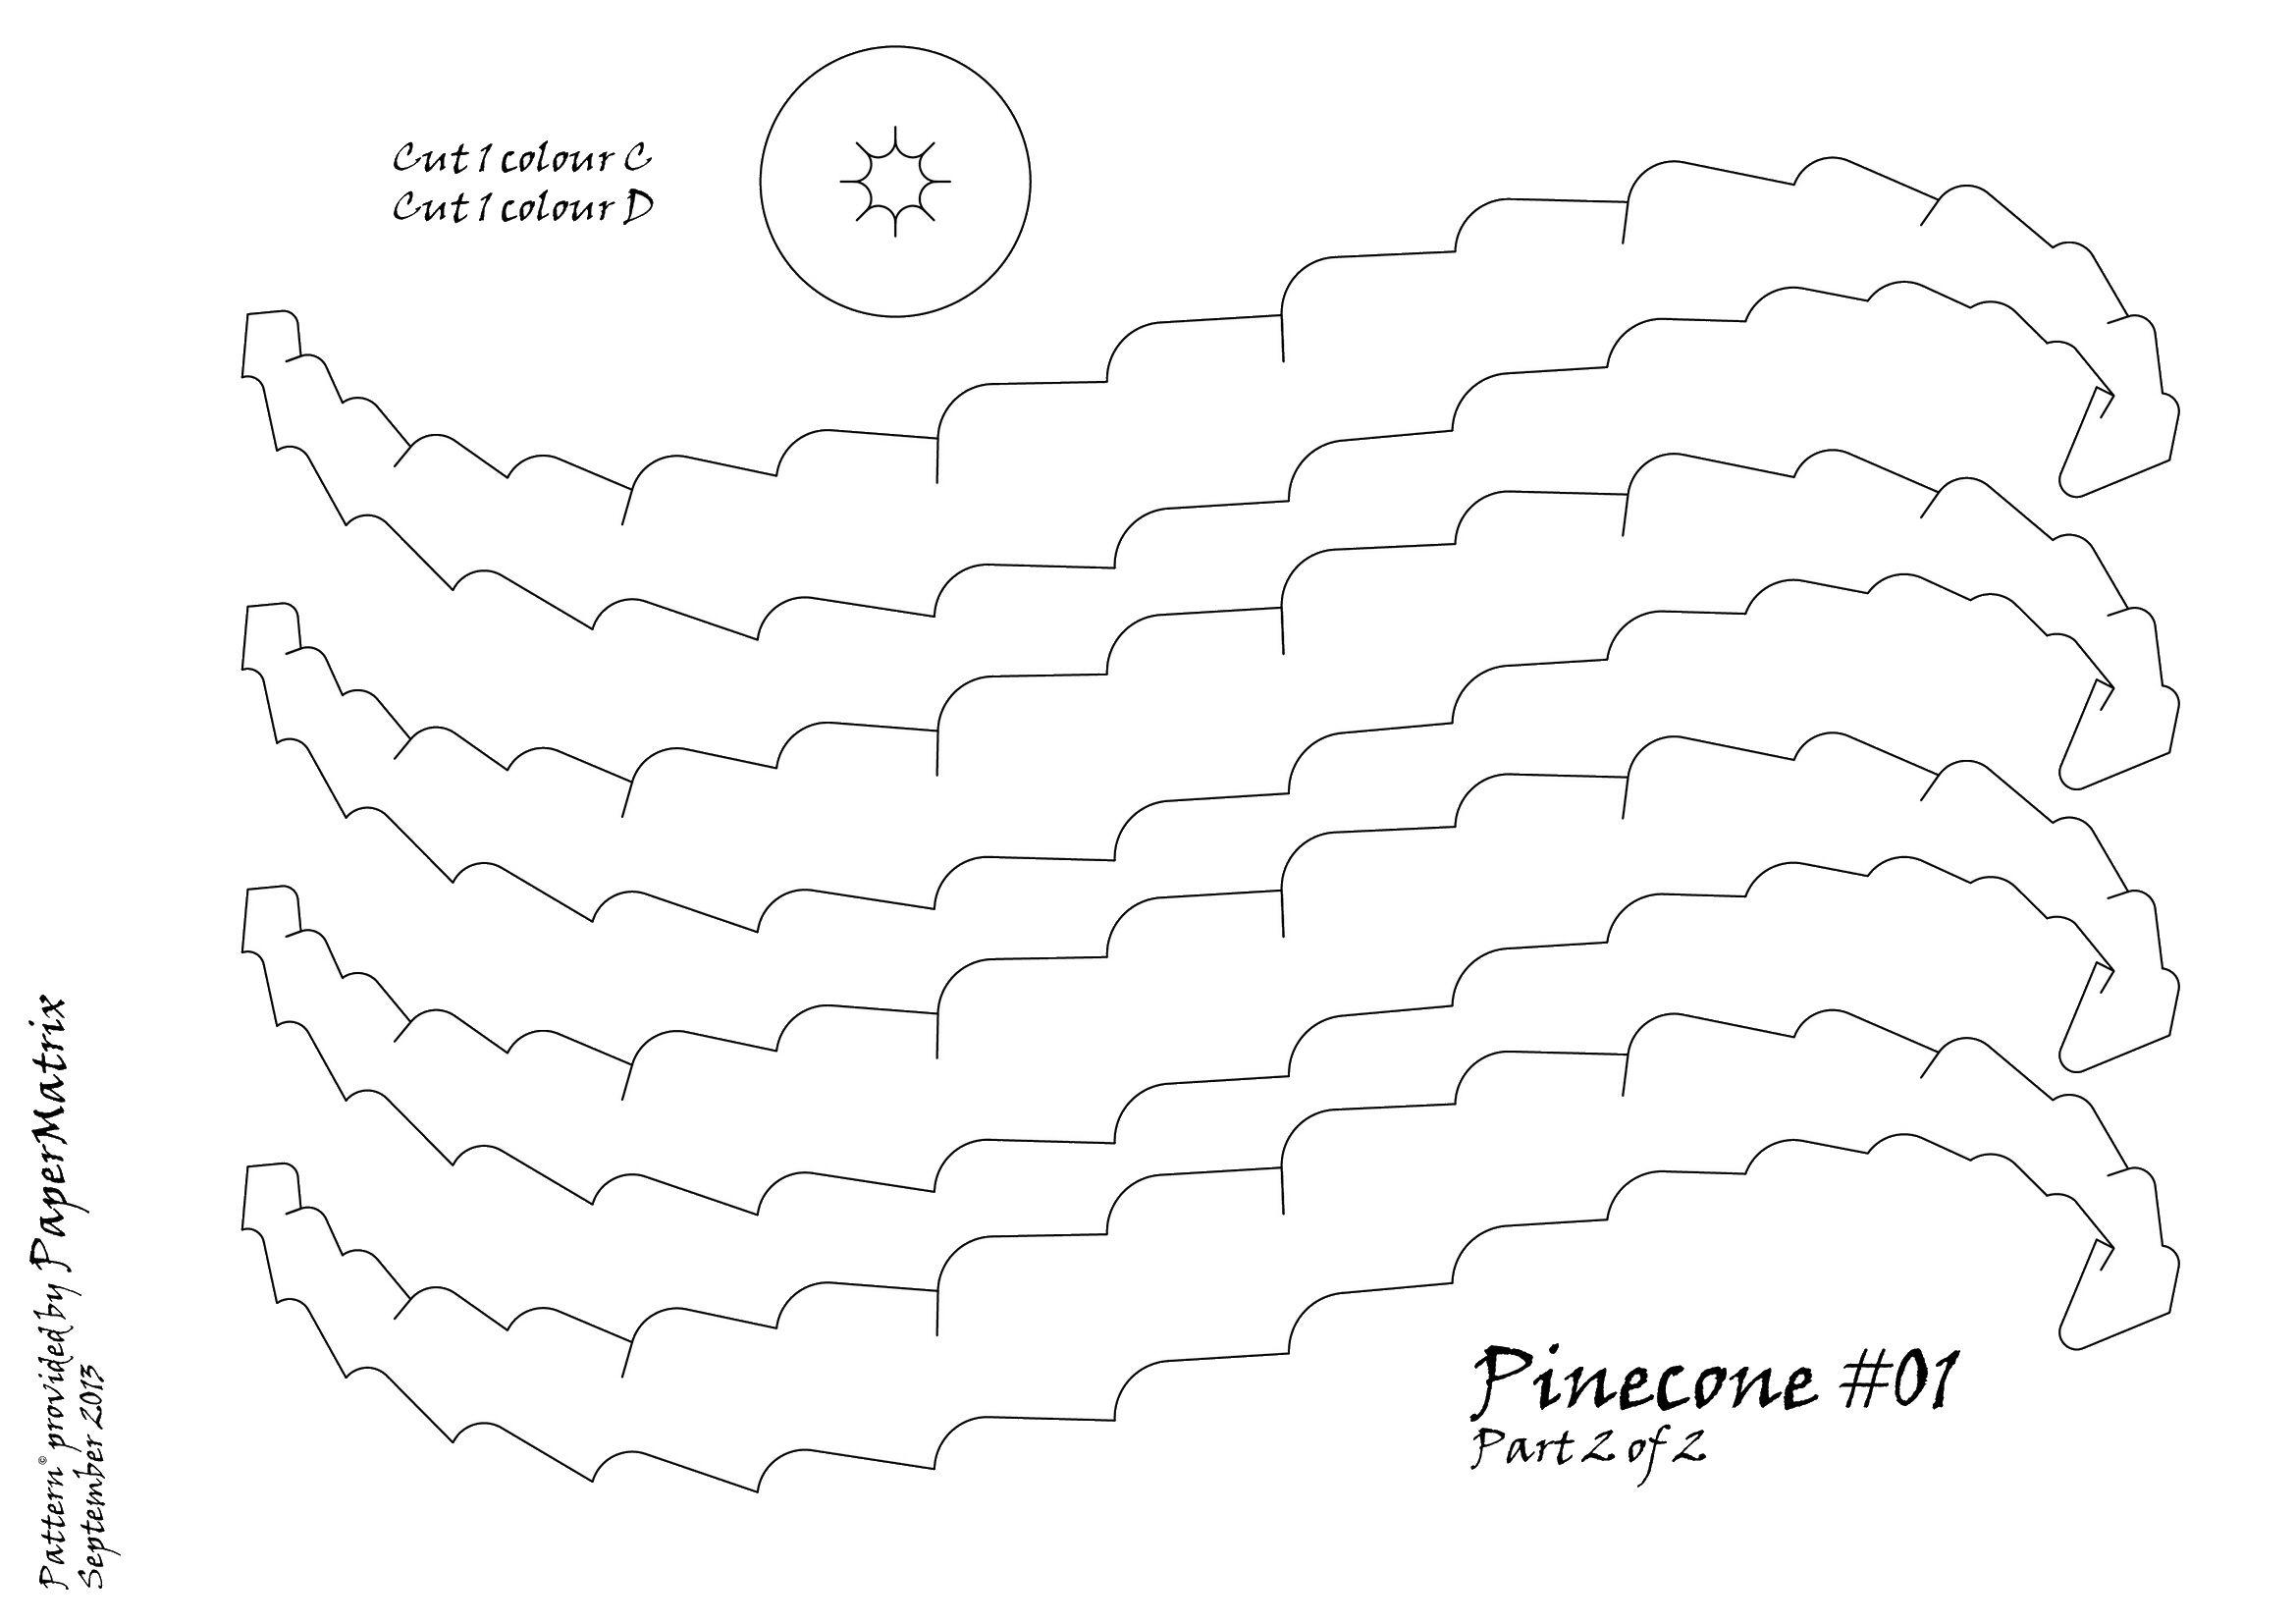 pinecone-01-2-pattern.jpg 2,339×1,654픽셀